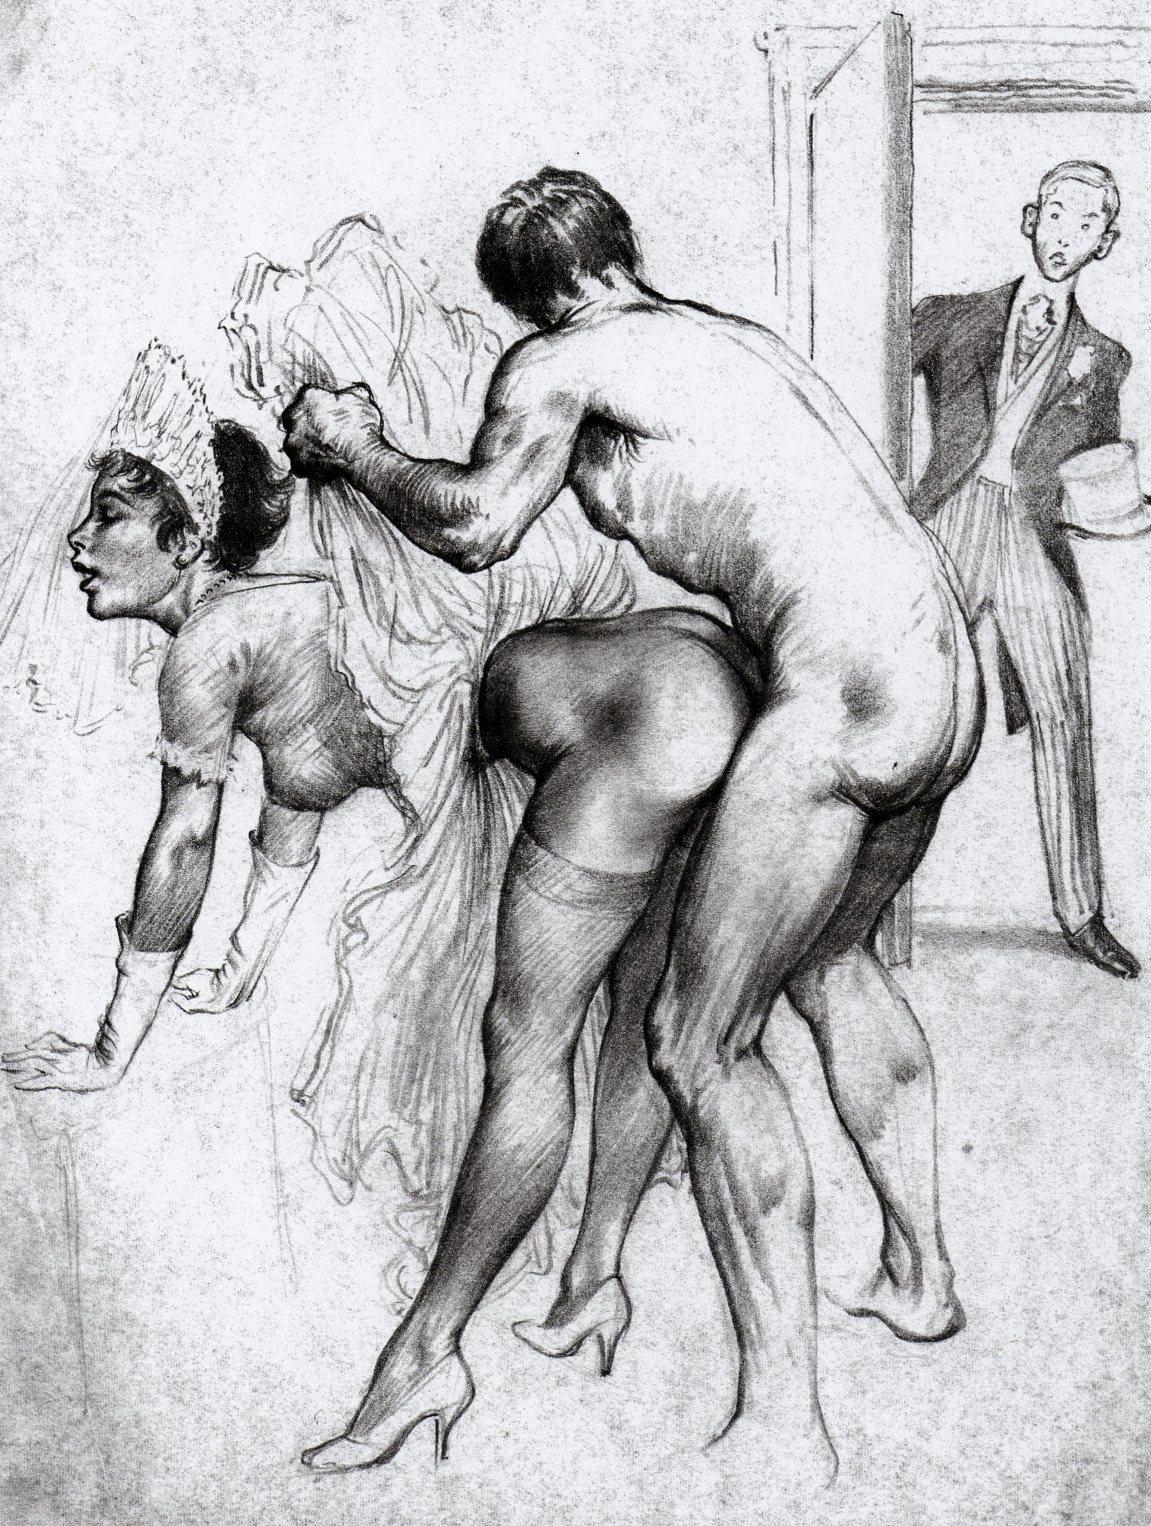 Fuck sex engilsh movei hentai pics